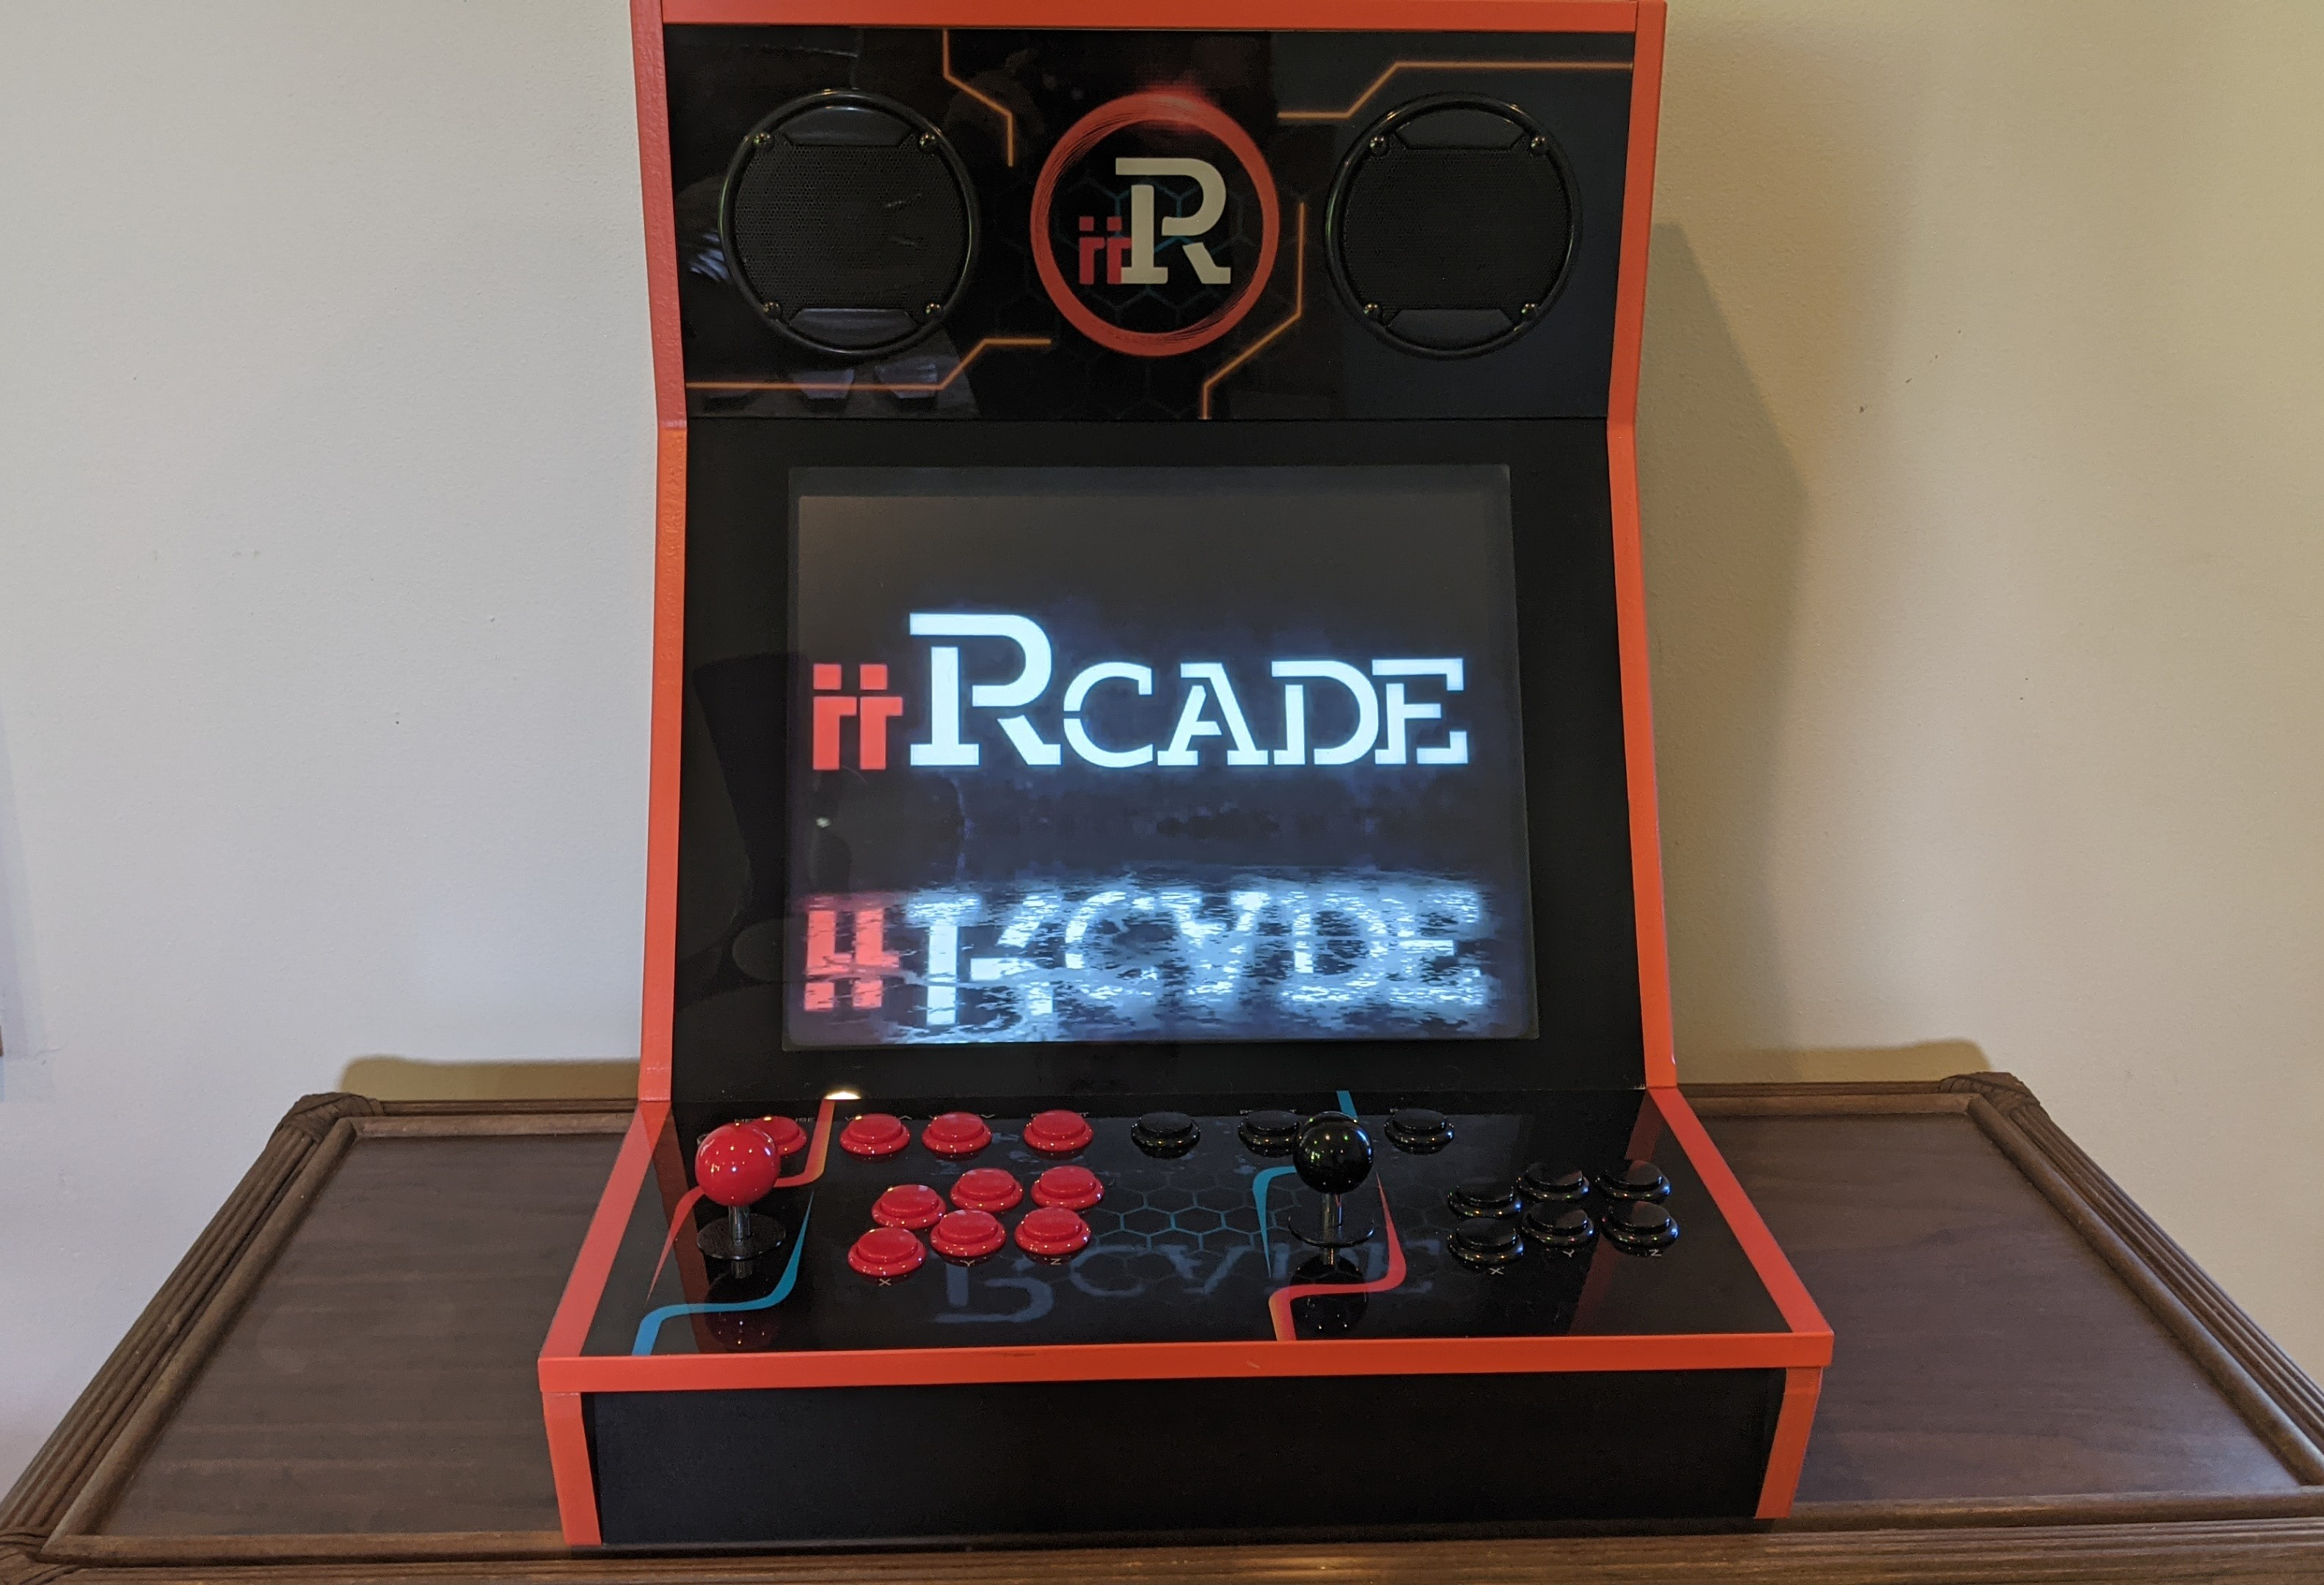 iiRcade Video Game Machine